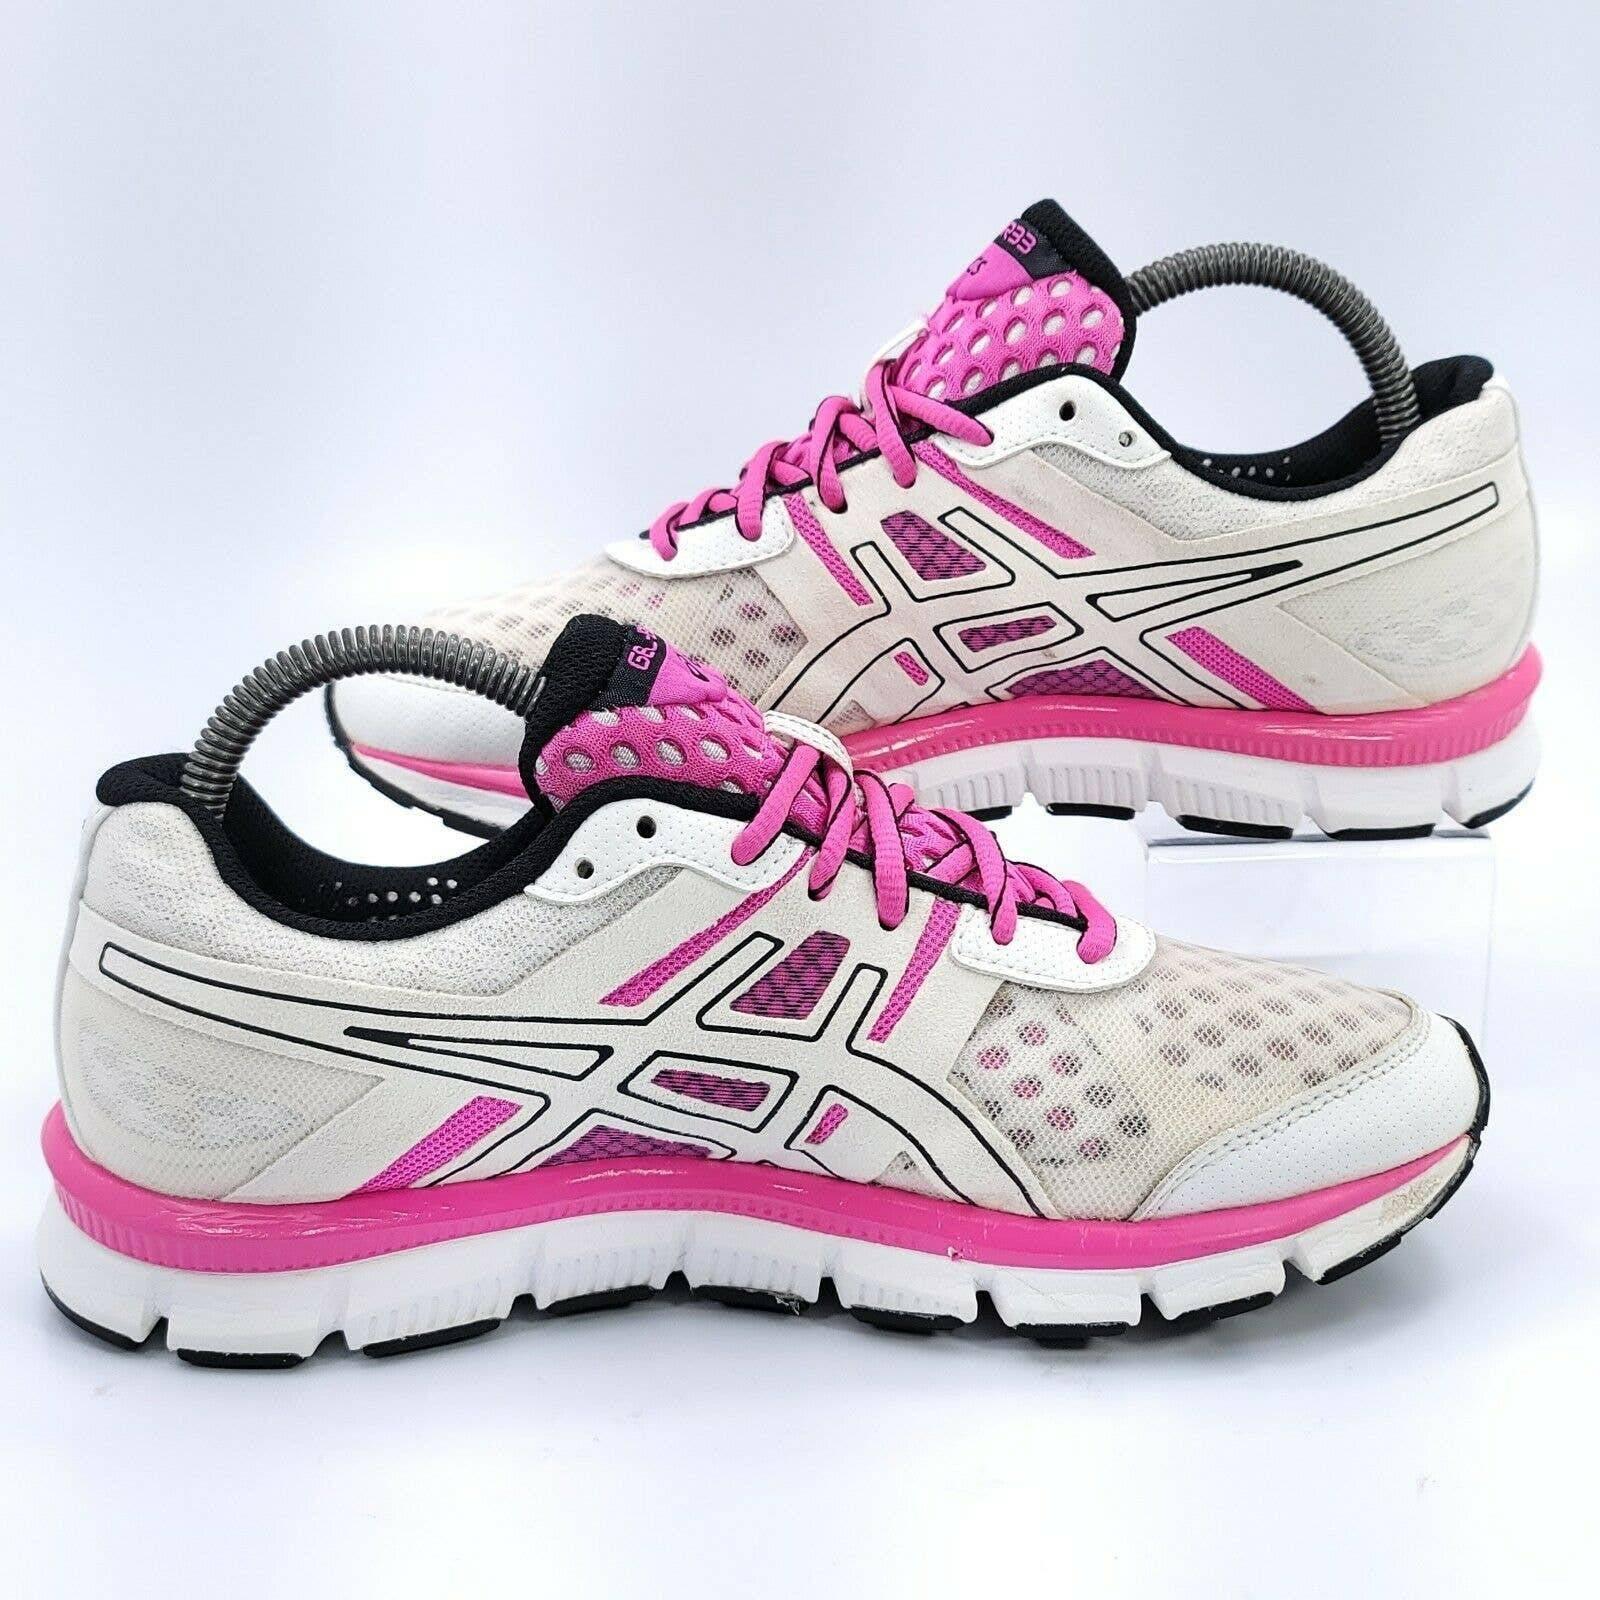 Asics Gel-Blur 33 Athletic Running Shoe